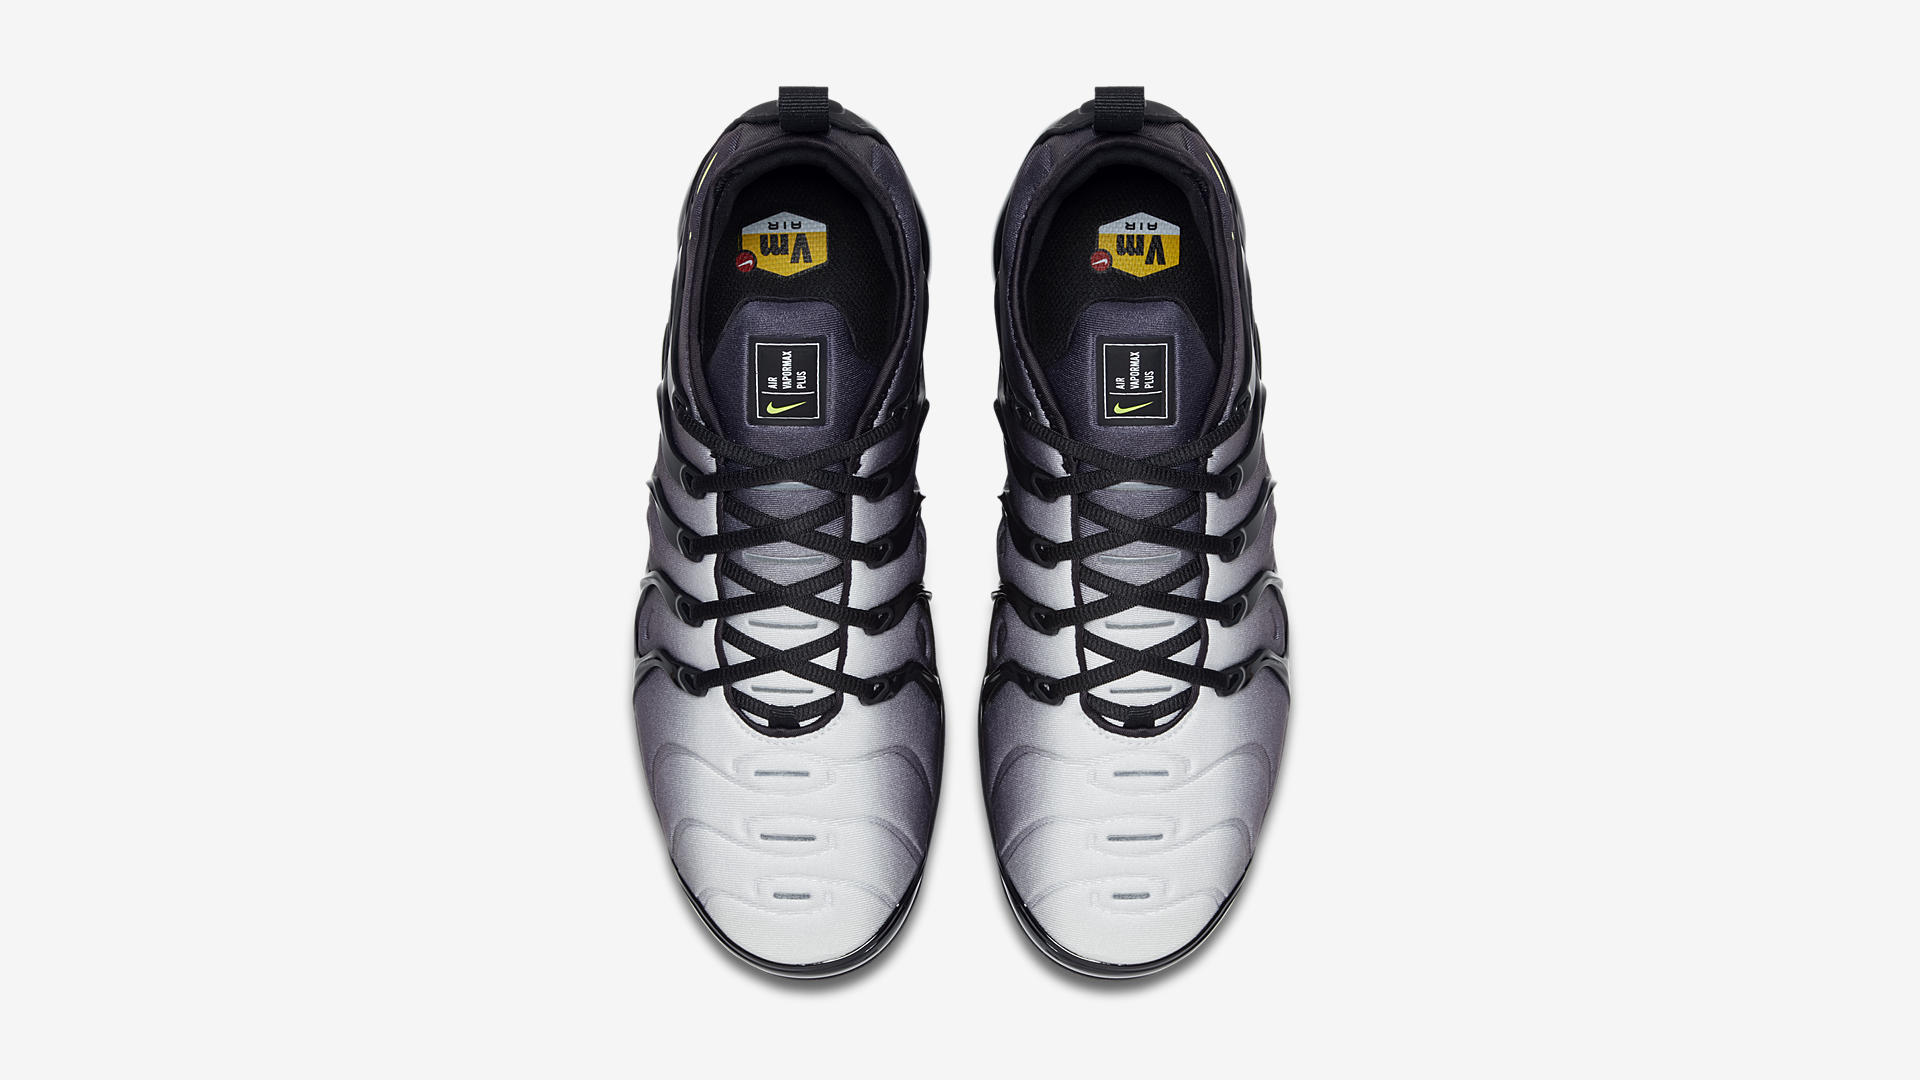 924453 009 Nike Air Vapormax Plus Black Volt 3